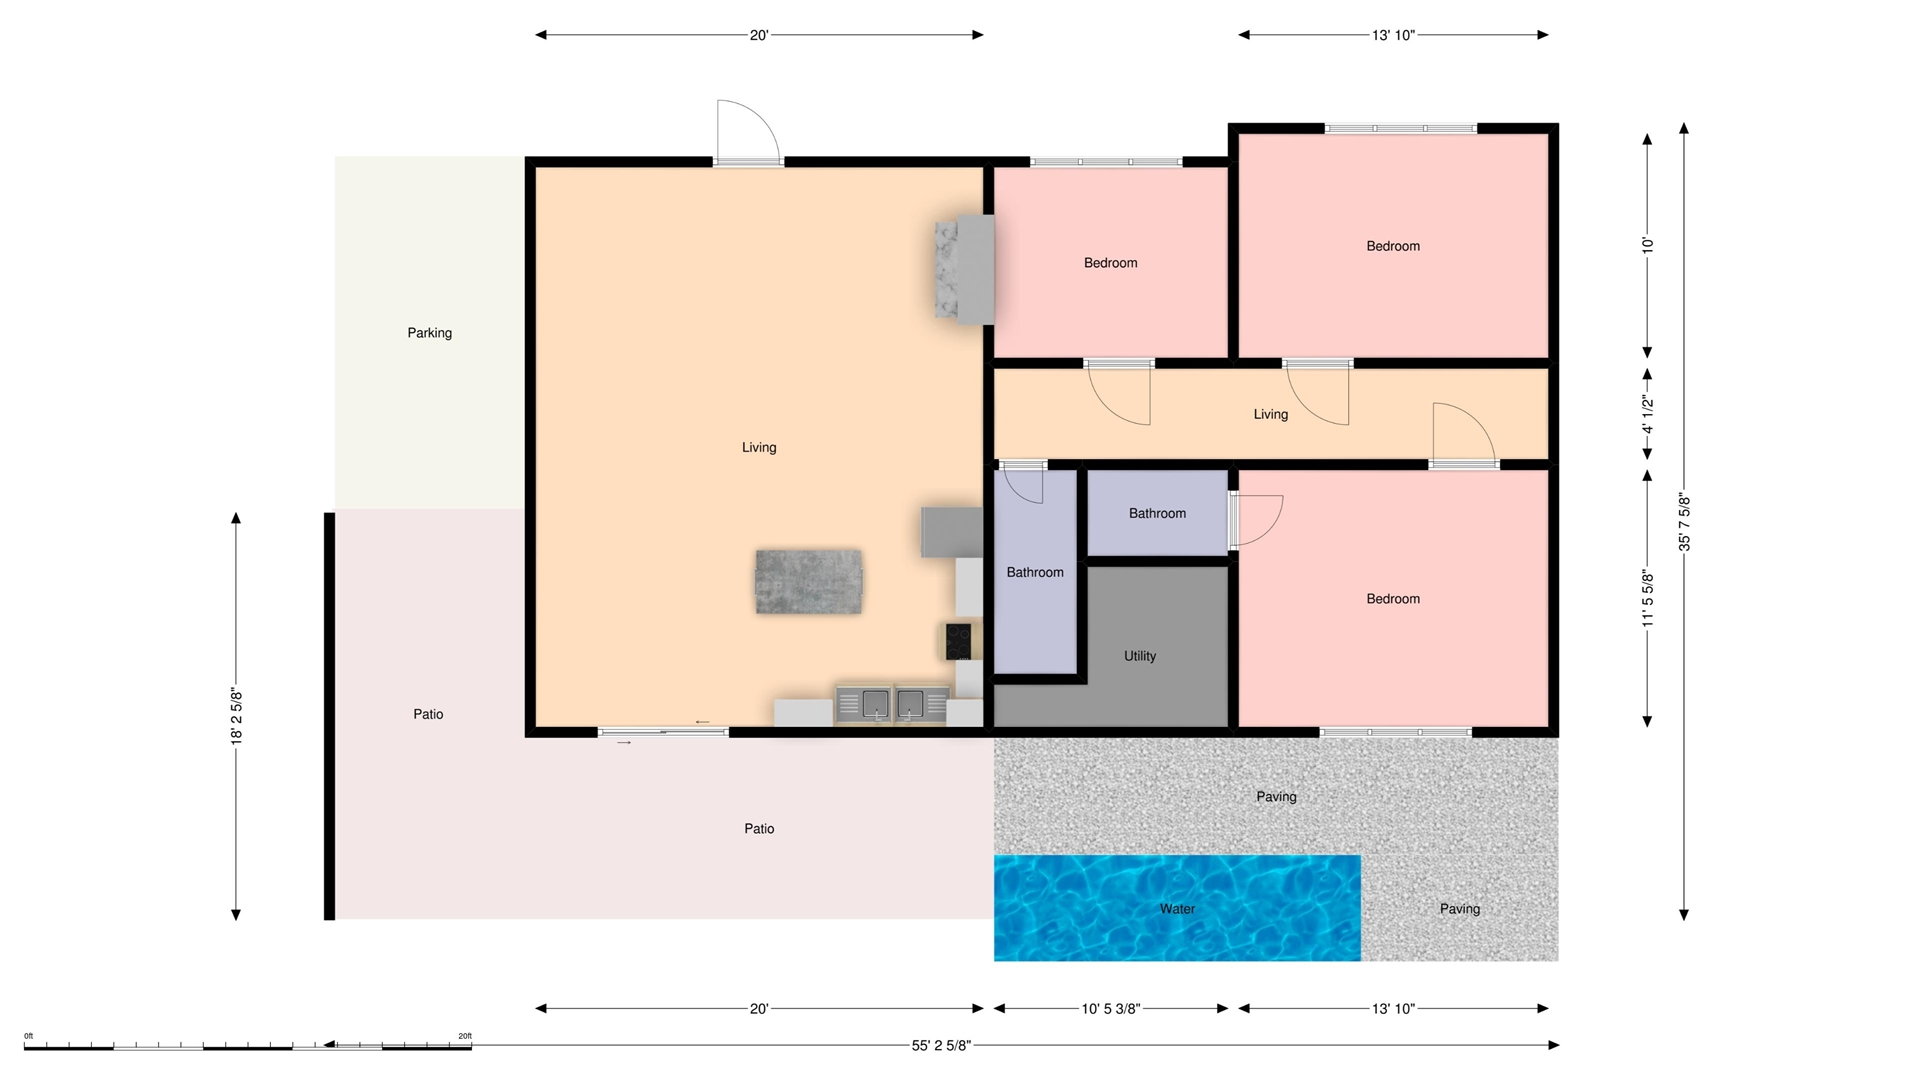 Floor Plan for Hook, Wine & Sinker Waterfront Single Family Pool Home